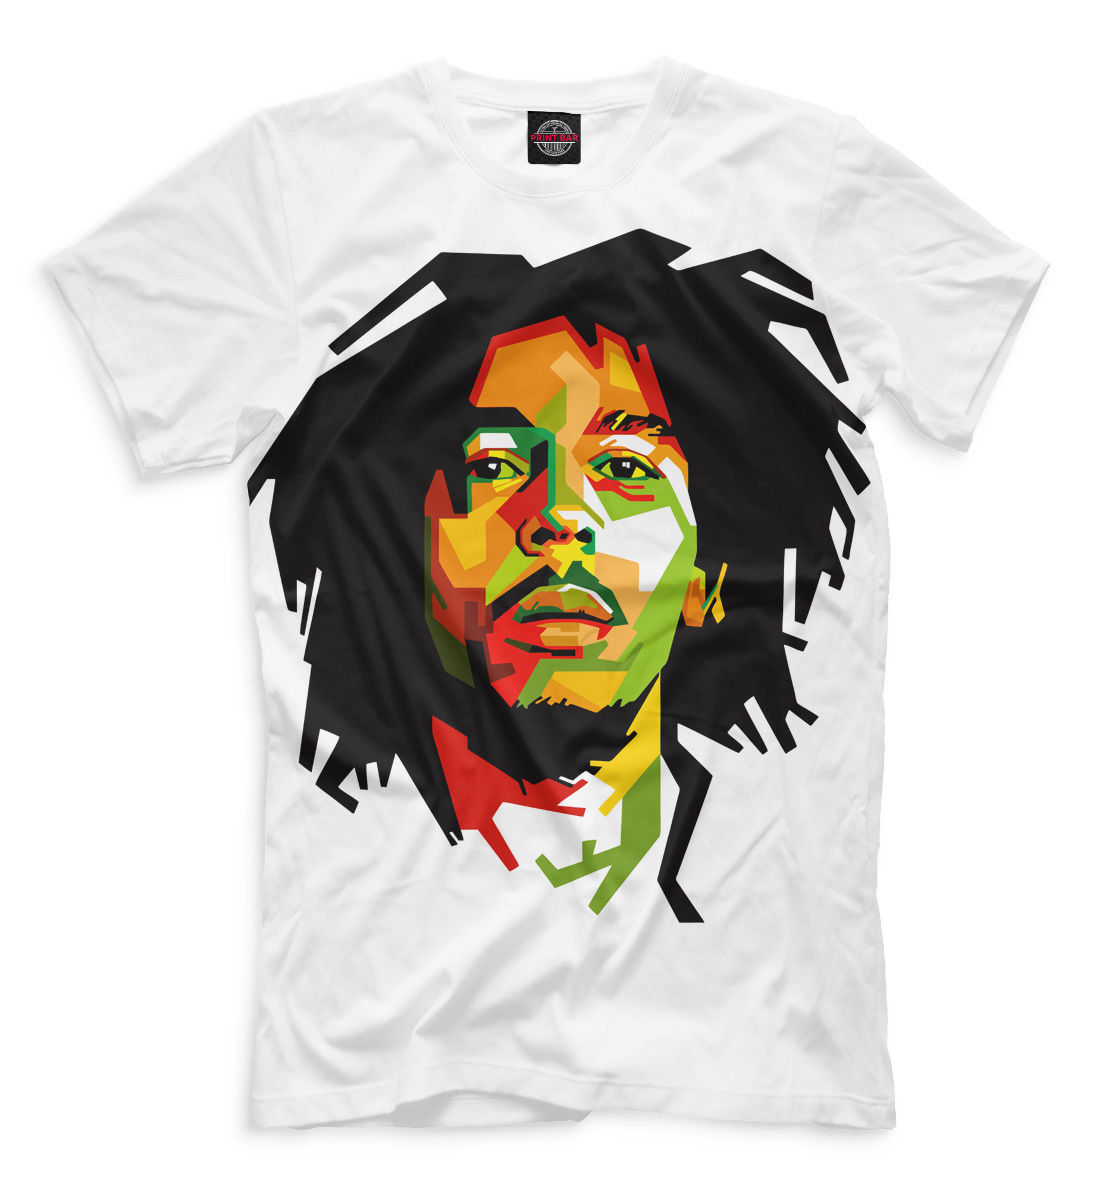 3e8cb3c458bf4d 2018 New Summer Fashion Tee Shirt BOB MARLEY NEW t-shirt rasta flag reggae  jamaica cool designe HQ print